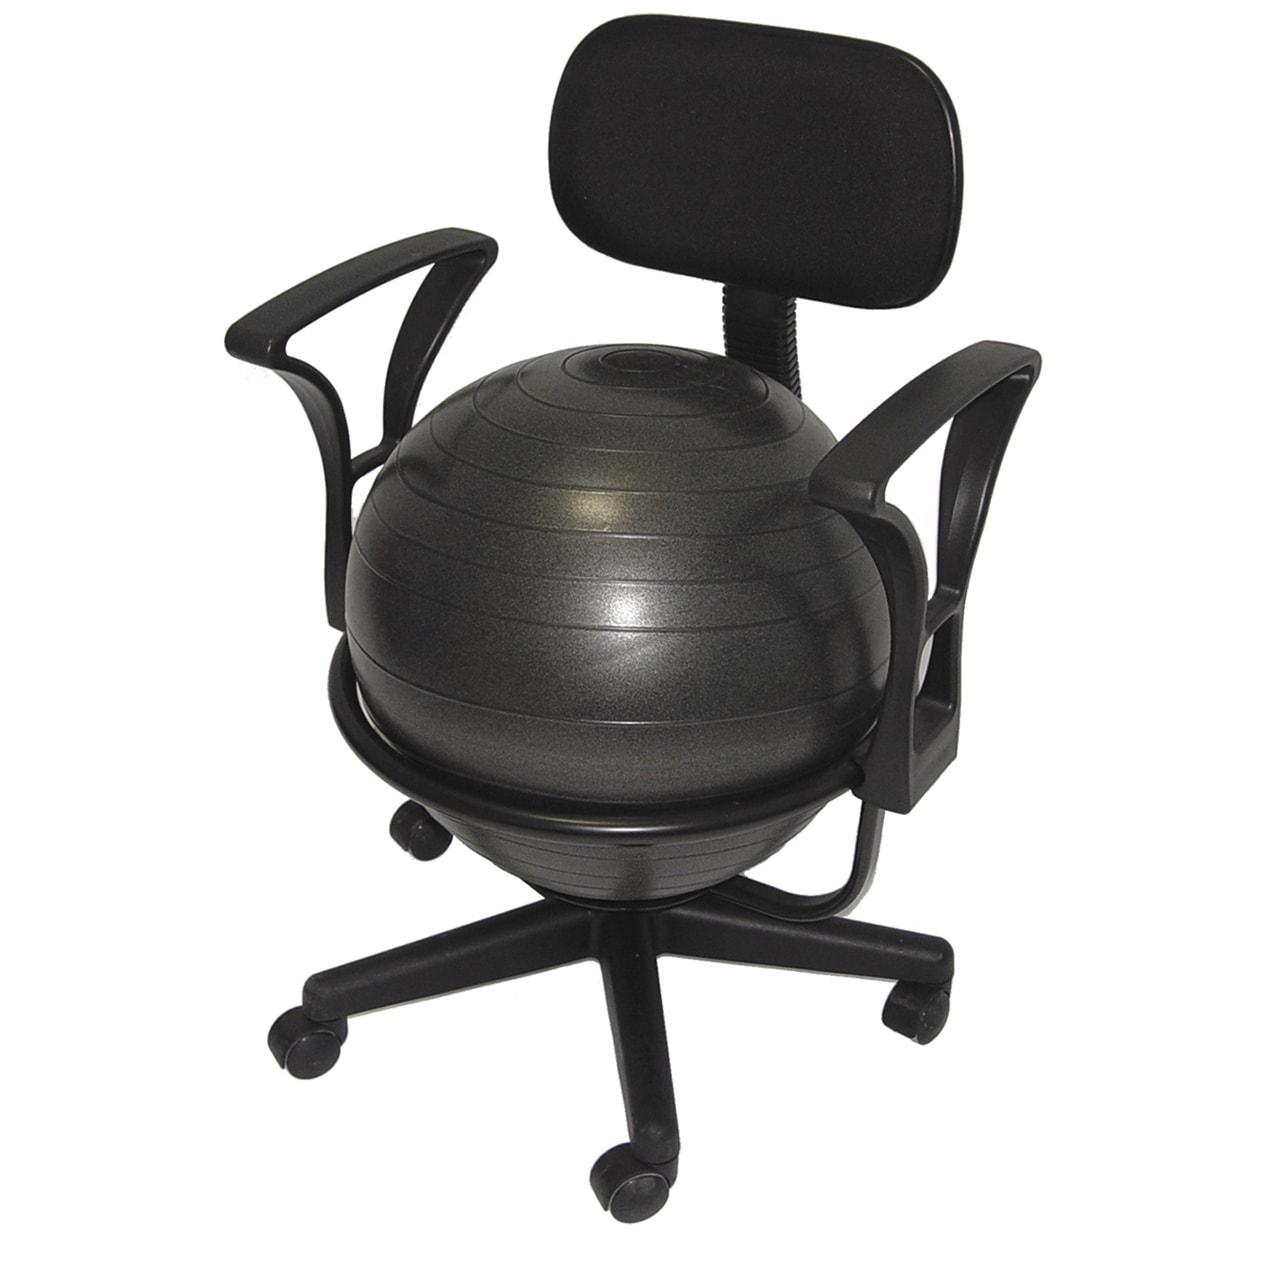 Aeromat Ball Chair Deluxe (Black Steel Construction)